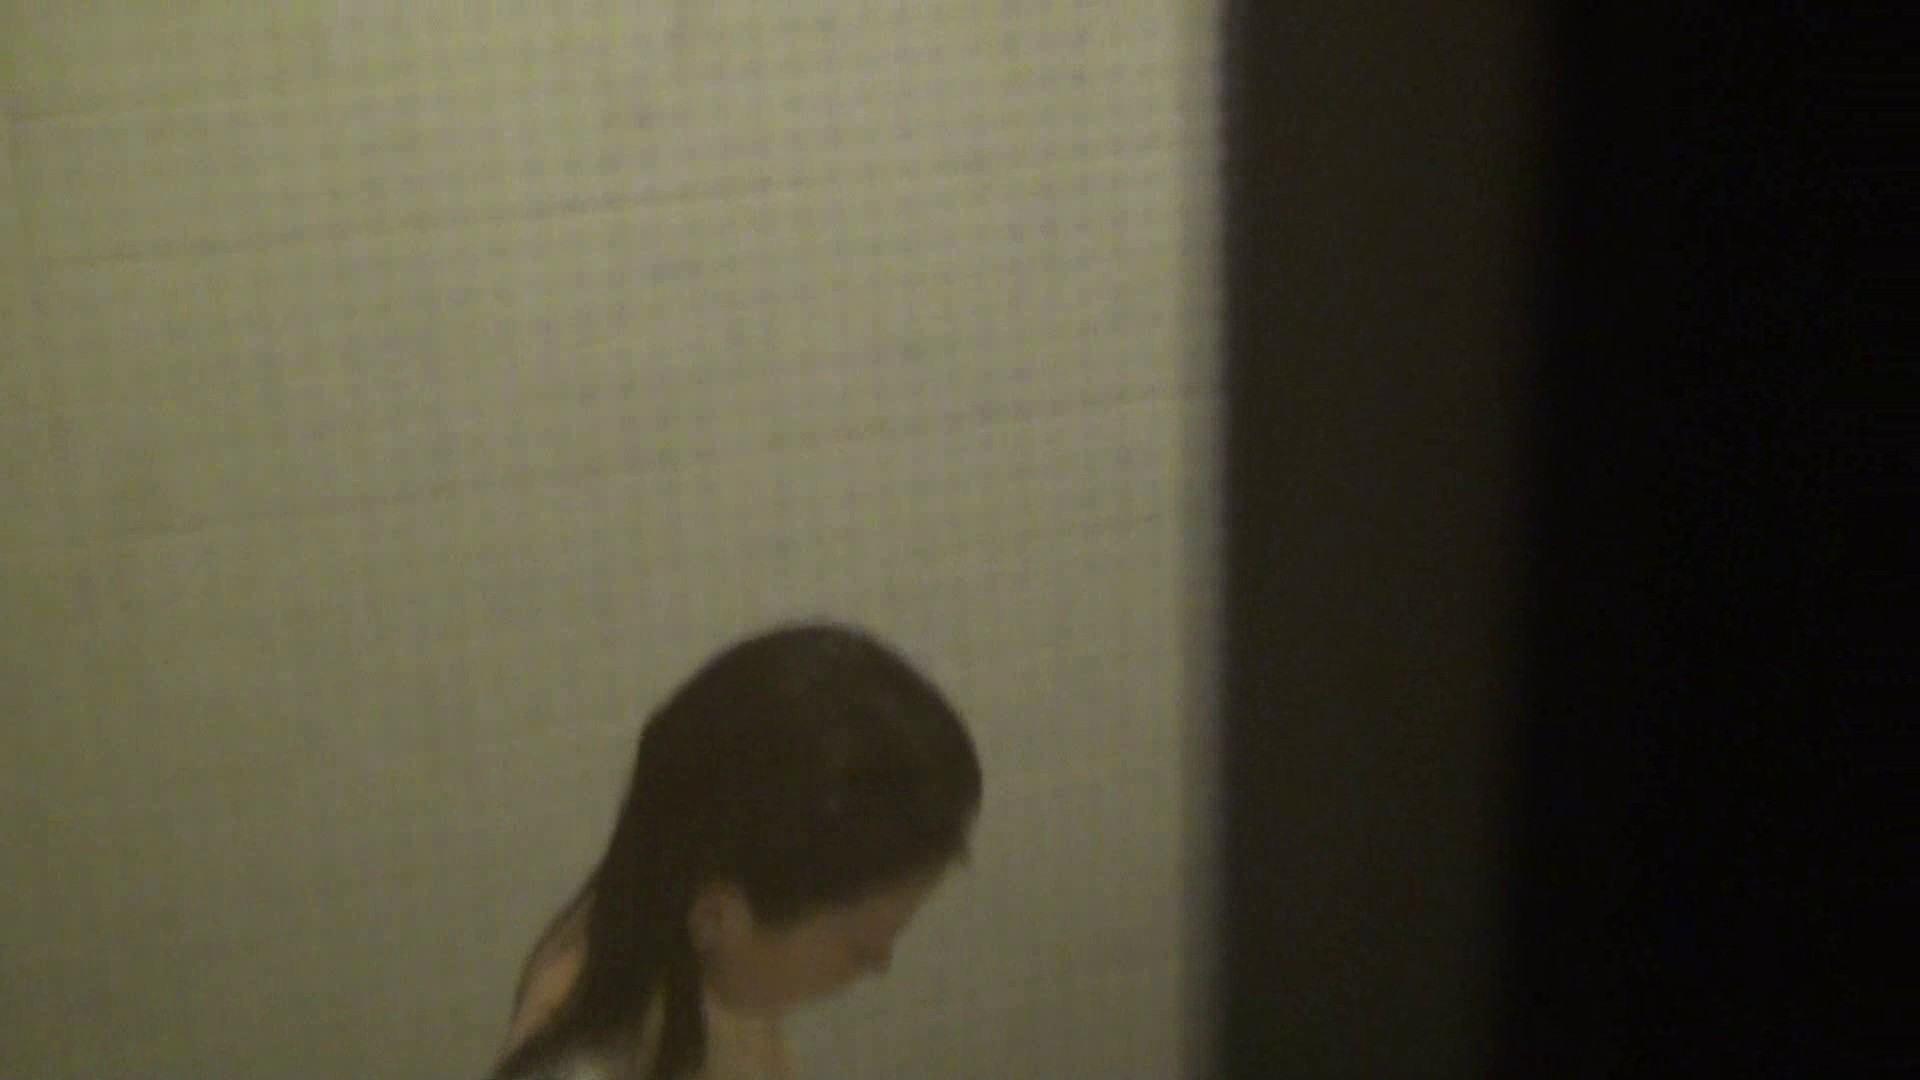 vol.06顔を洗い流す極上お女市さんの裸体をハイビジョンで!風呂上り着替え必見! お姉さん攻略 スケベ動画紹介 68画像 26